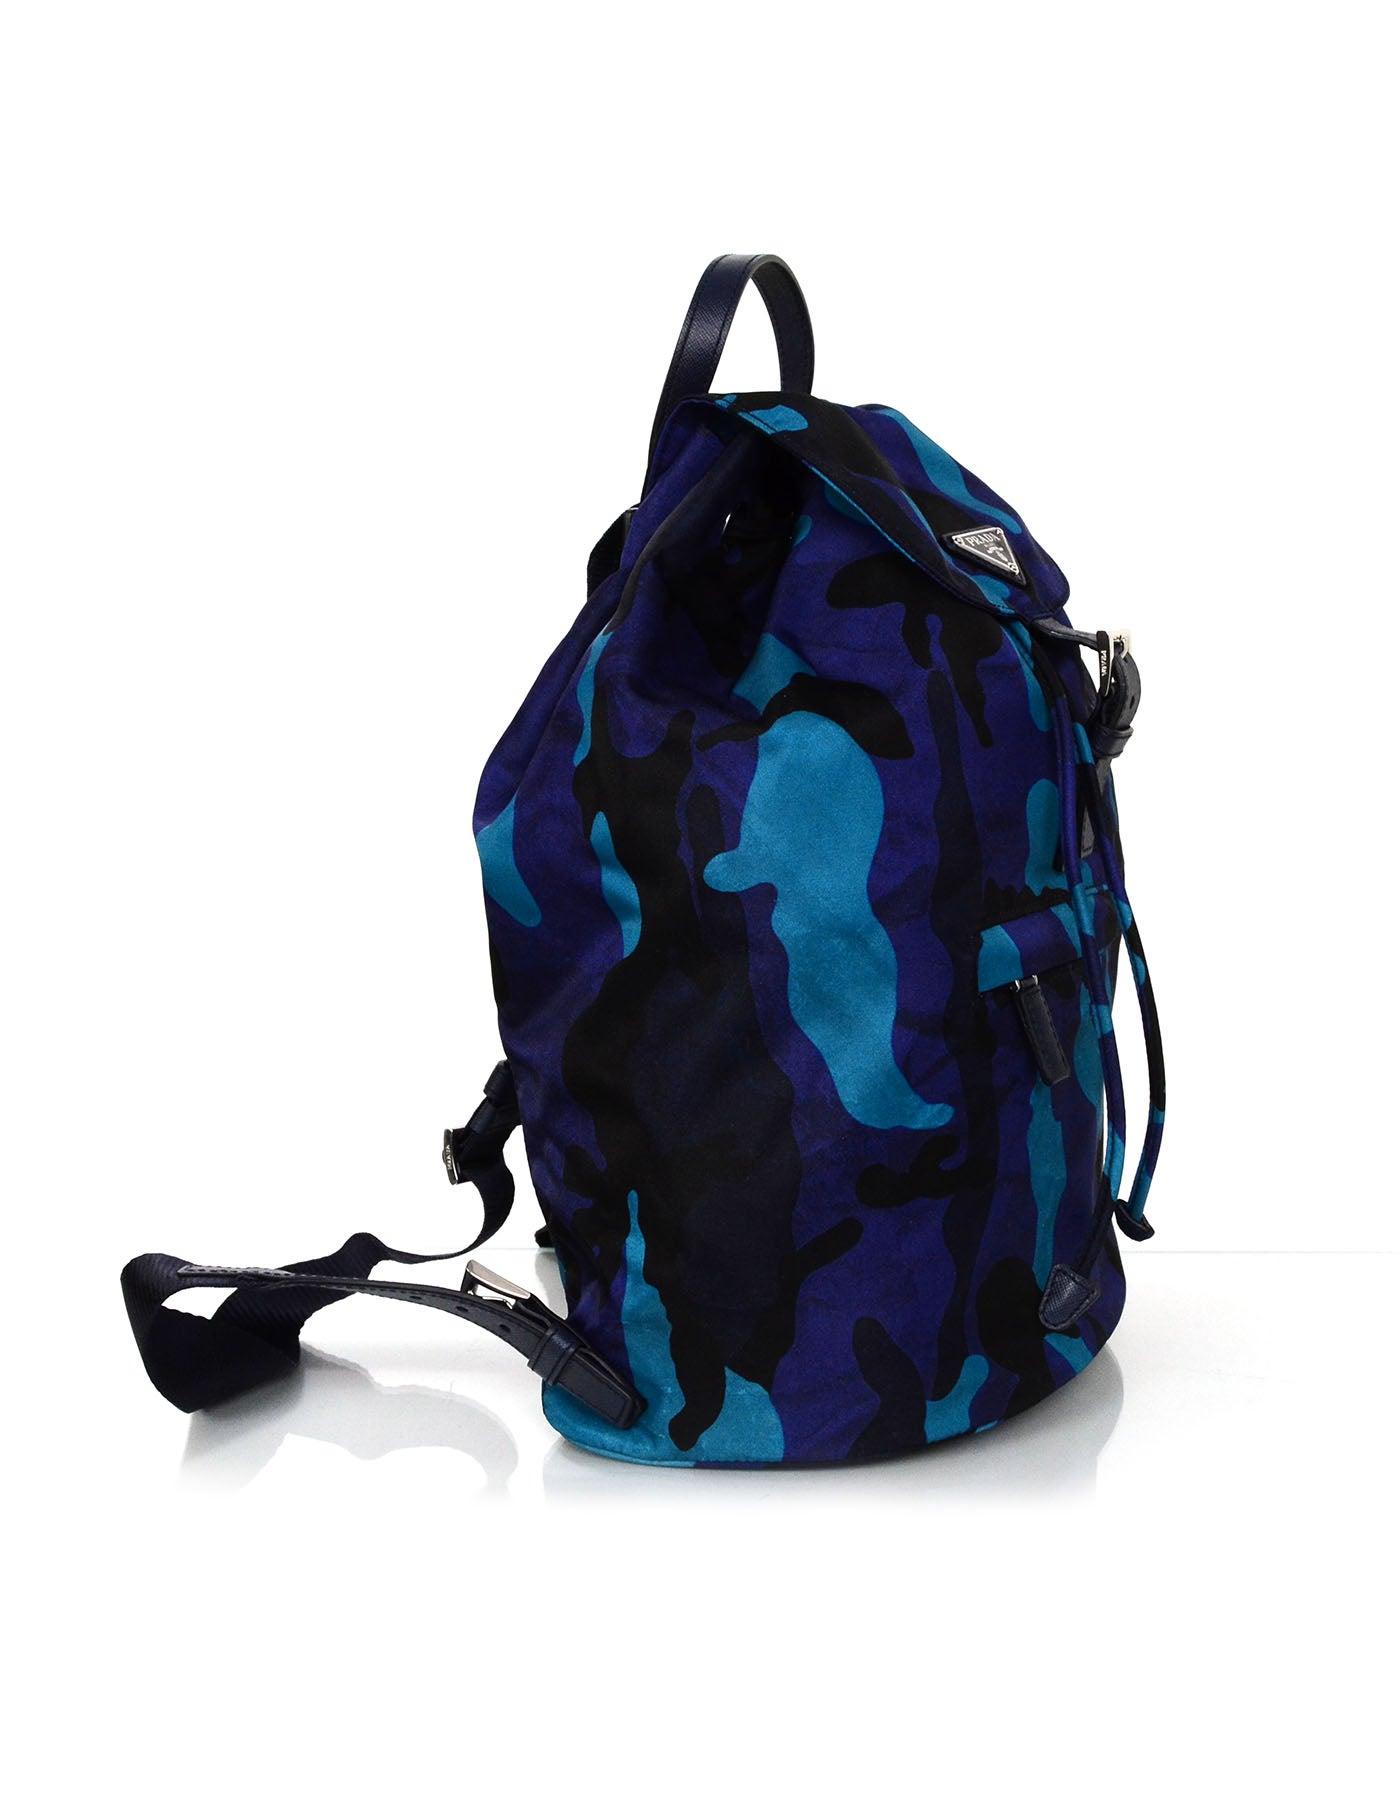 a96a0b656196 Prada Black and Blue Camo Print Nylon Backpack Bag For Sale at 1stdibs